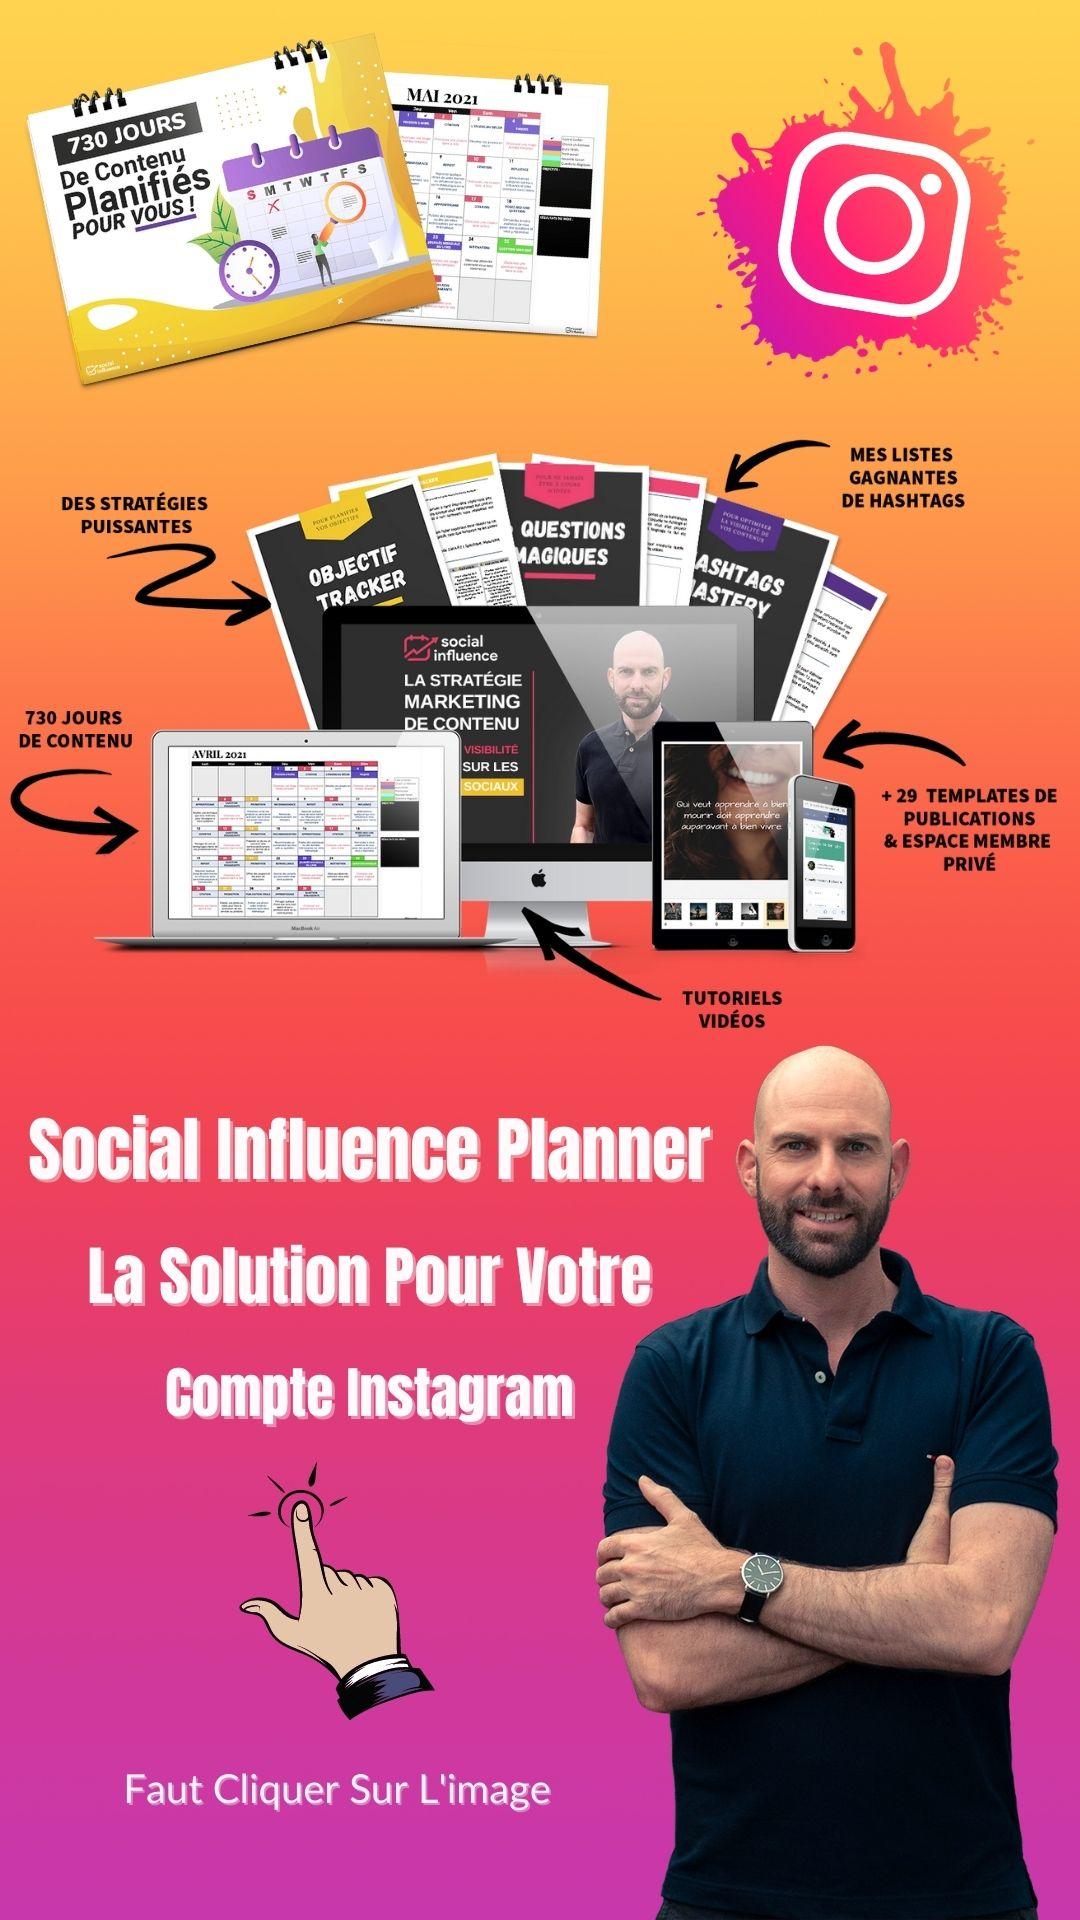 calendrier-marketing-social-influence-planer